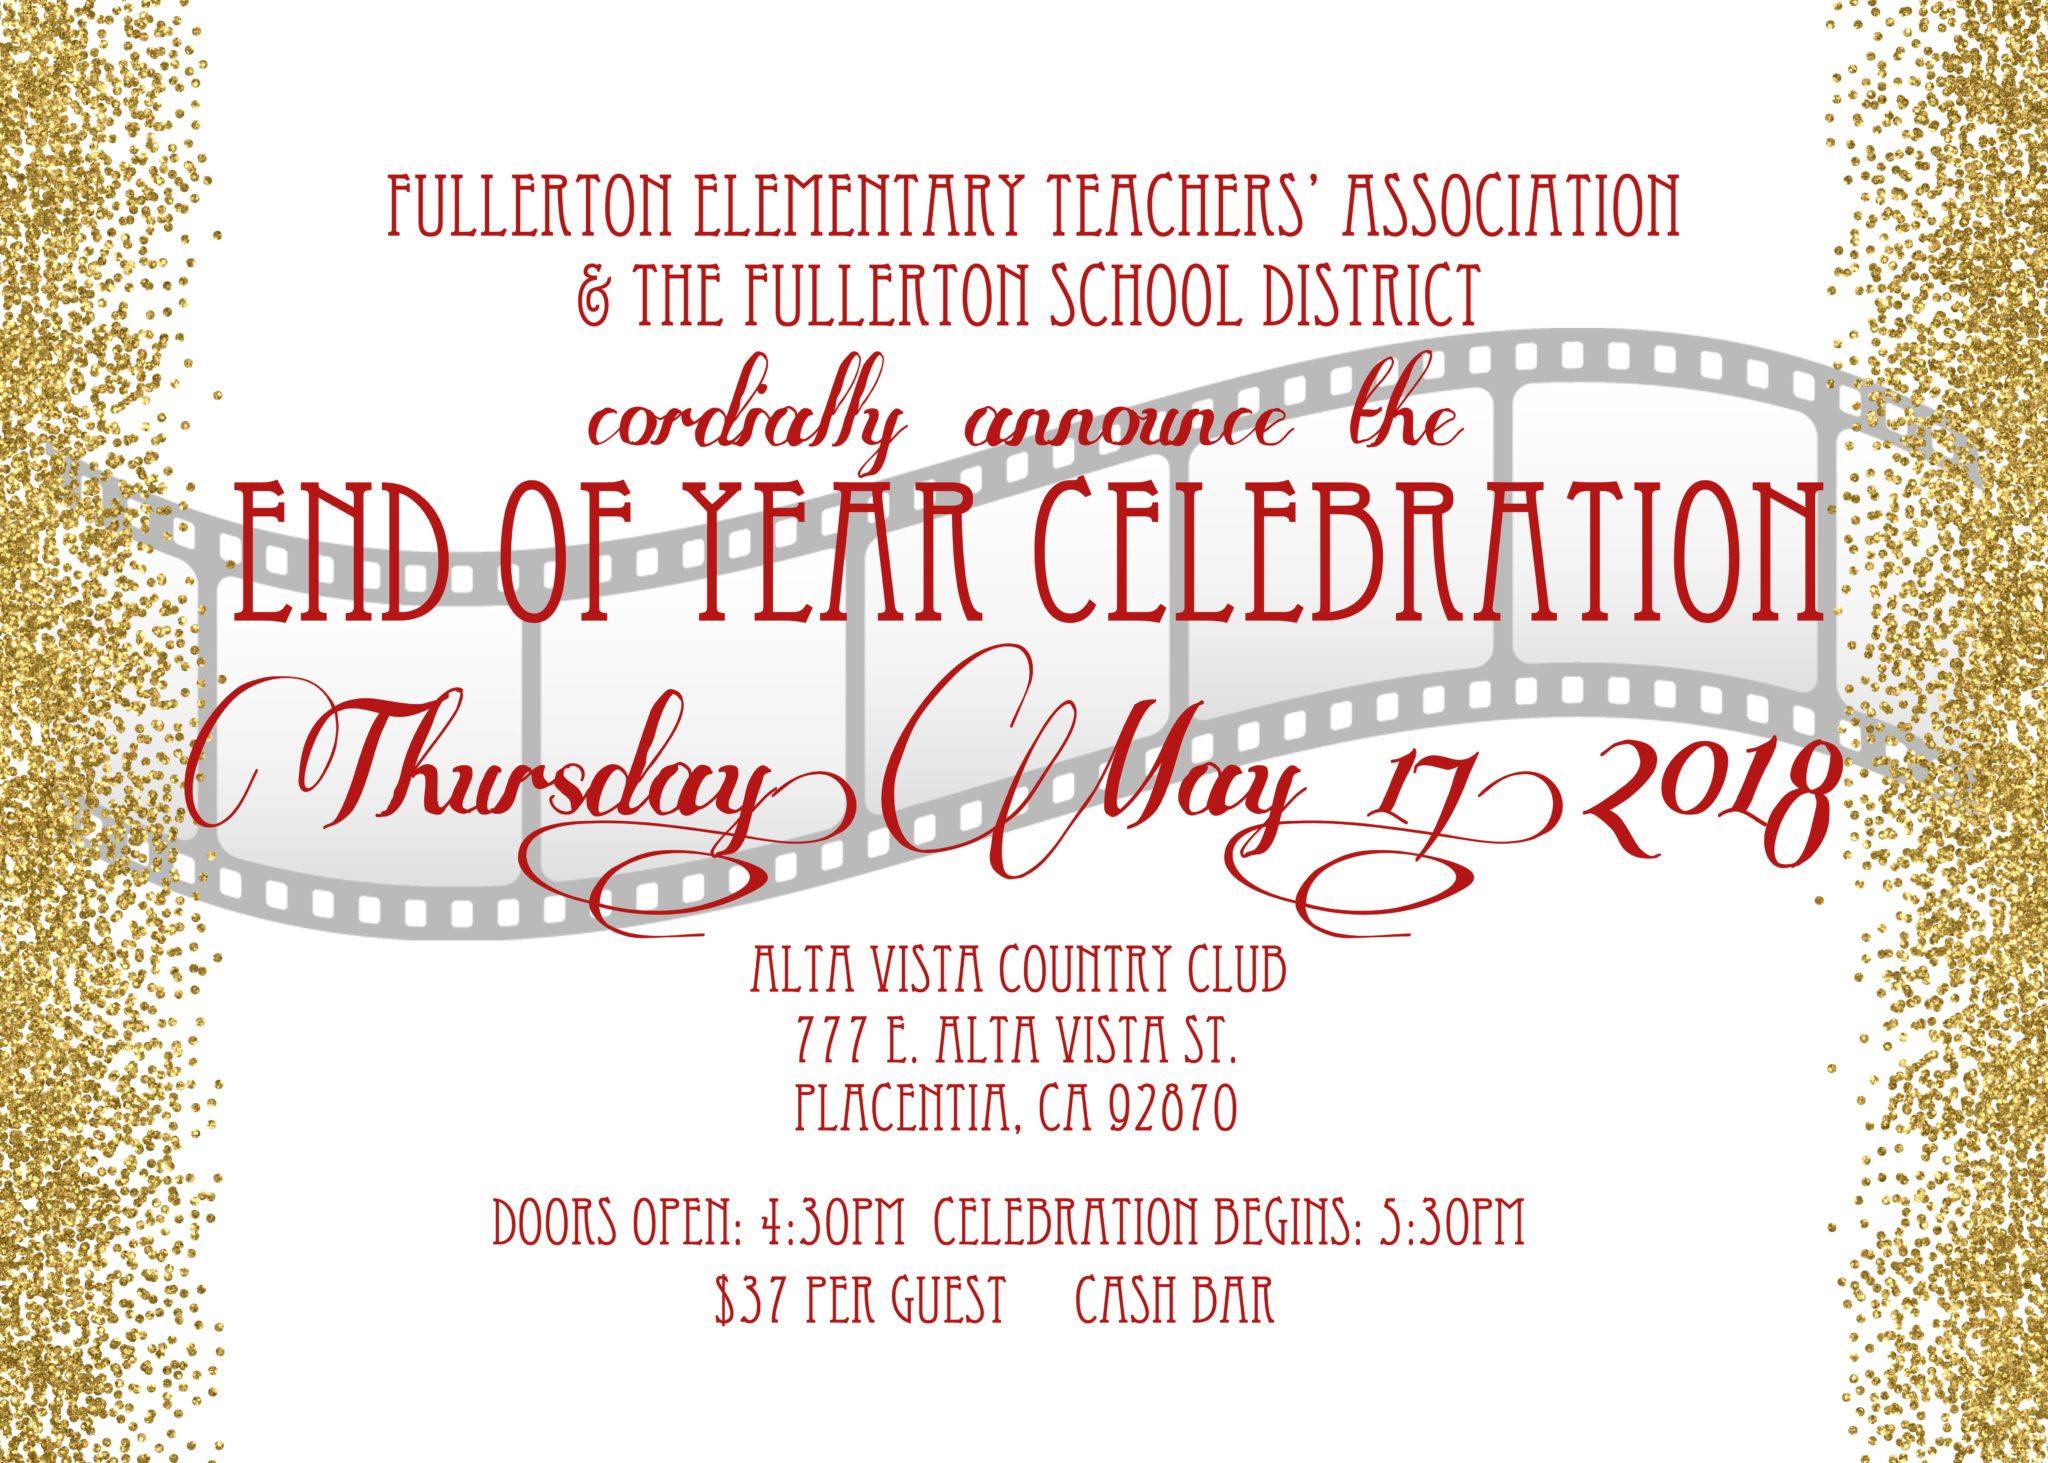 FETA-Celebration